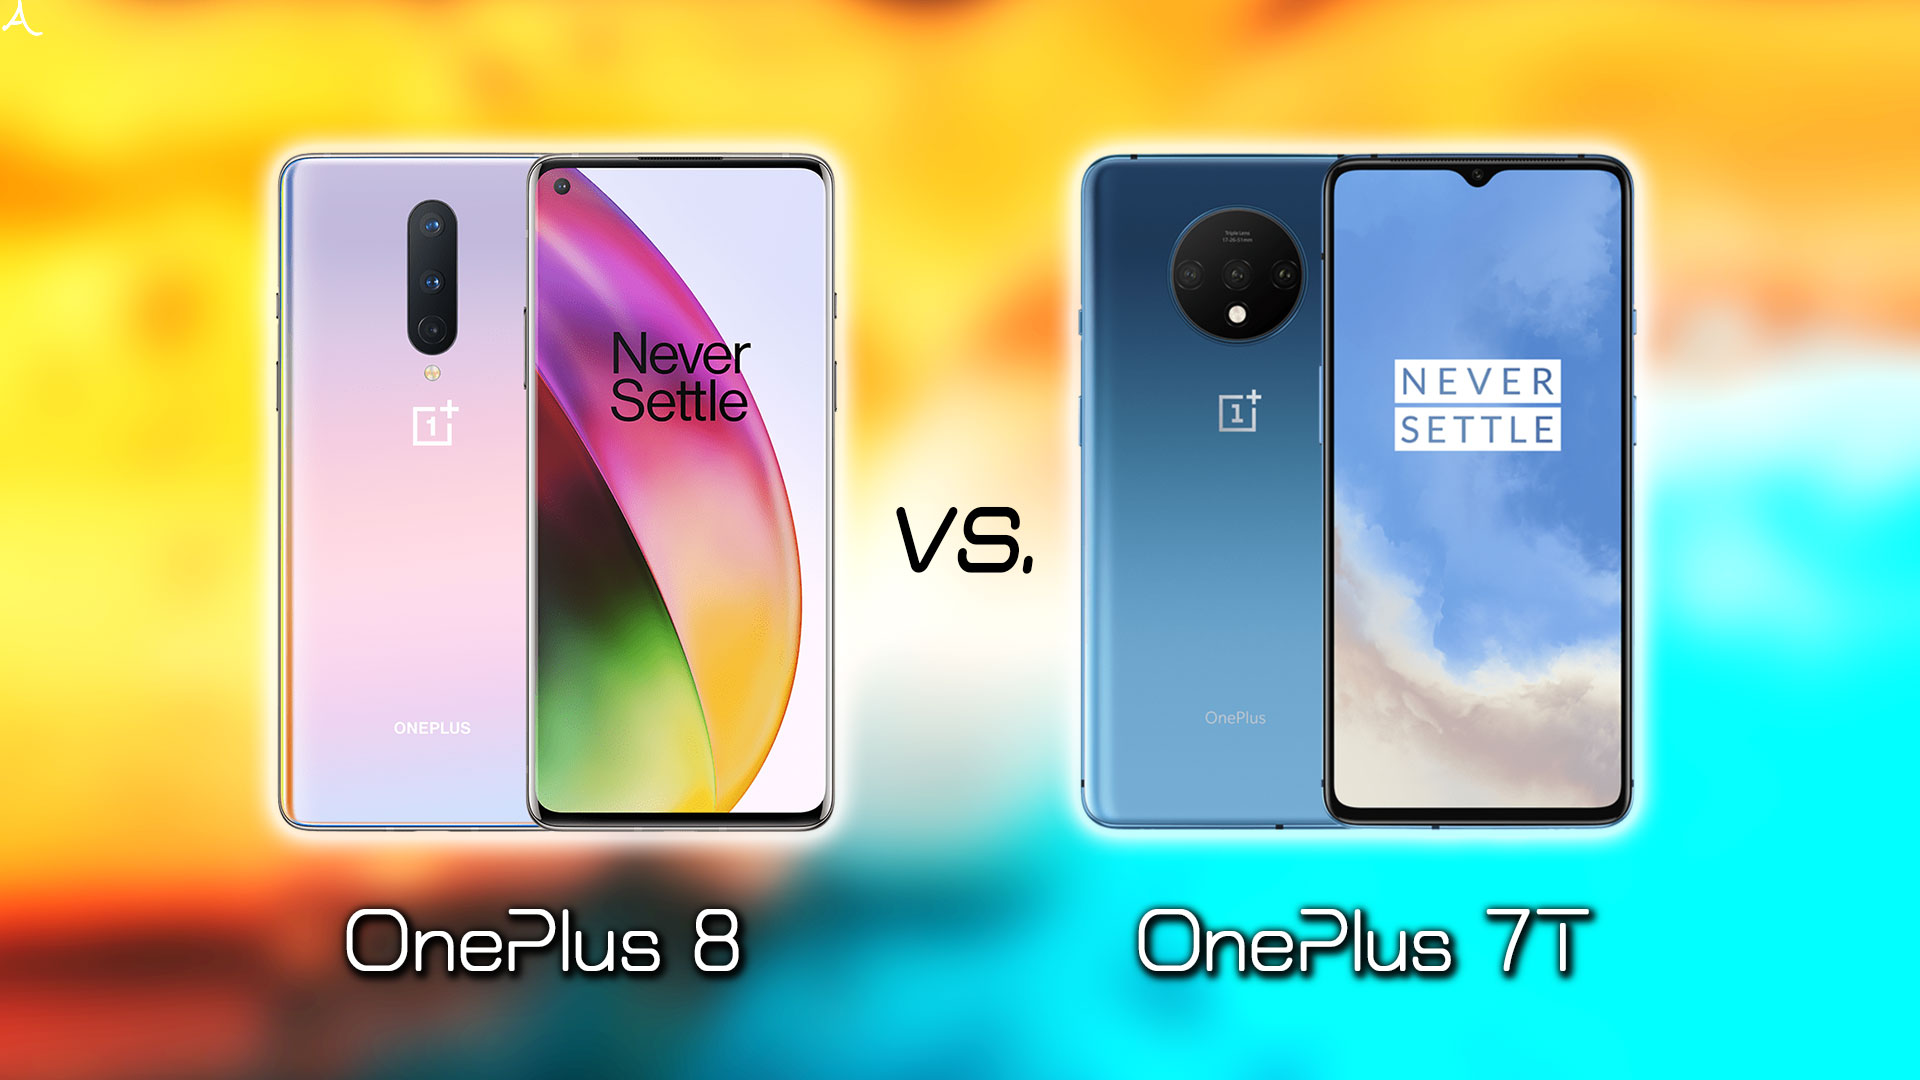 「OnePlus 8」と「OnePlus 7T」のスペックや違いを細かく比較